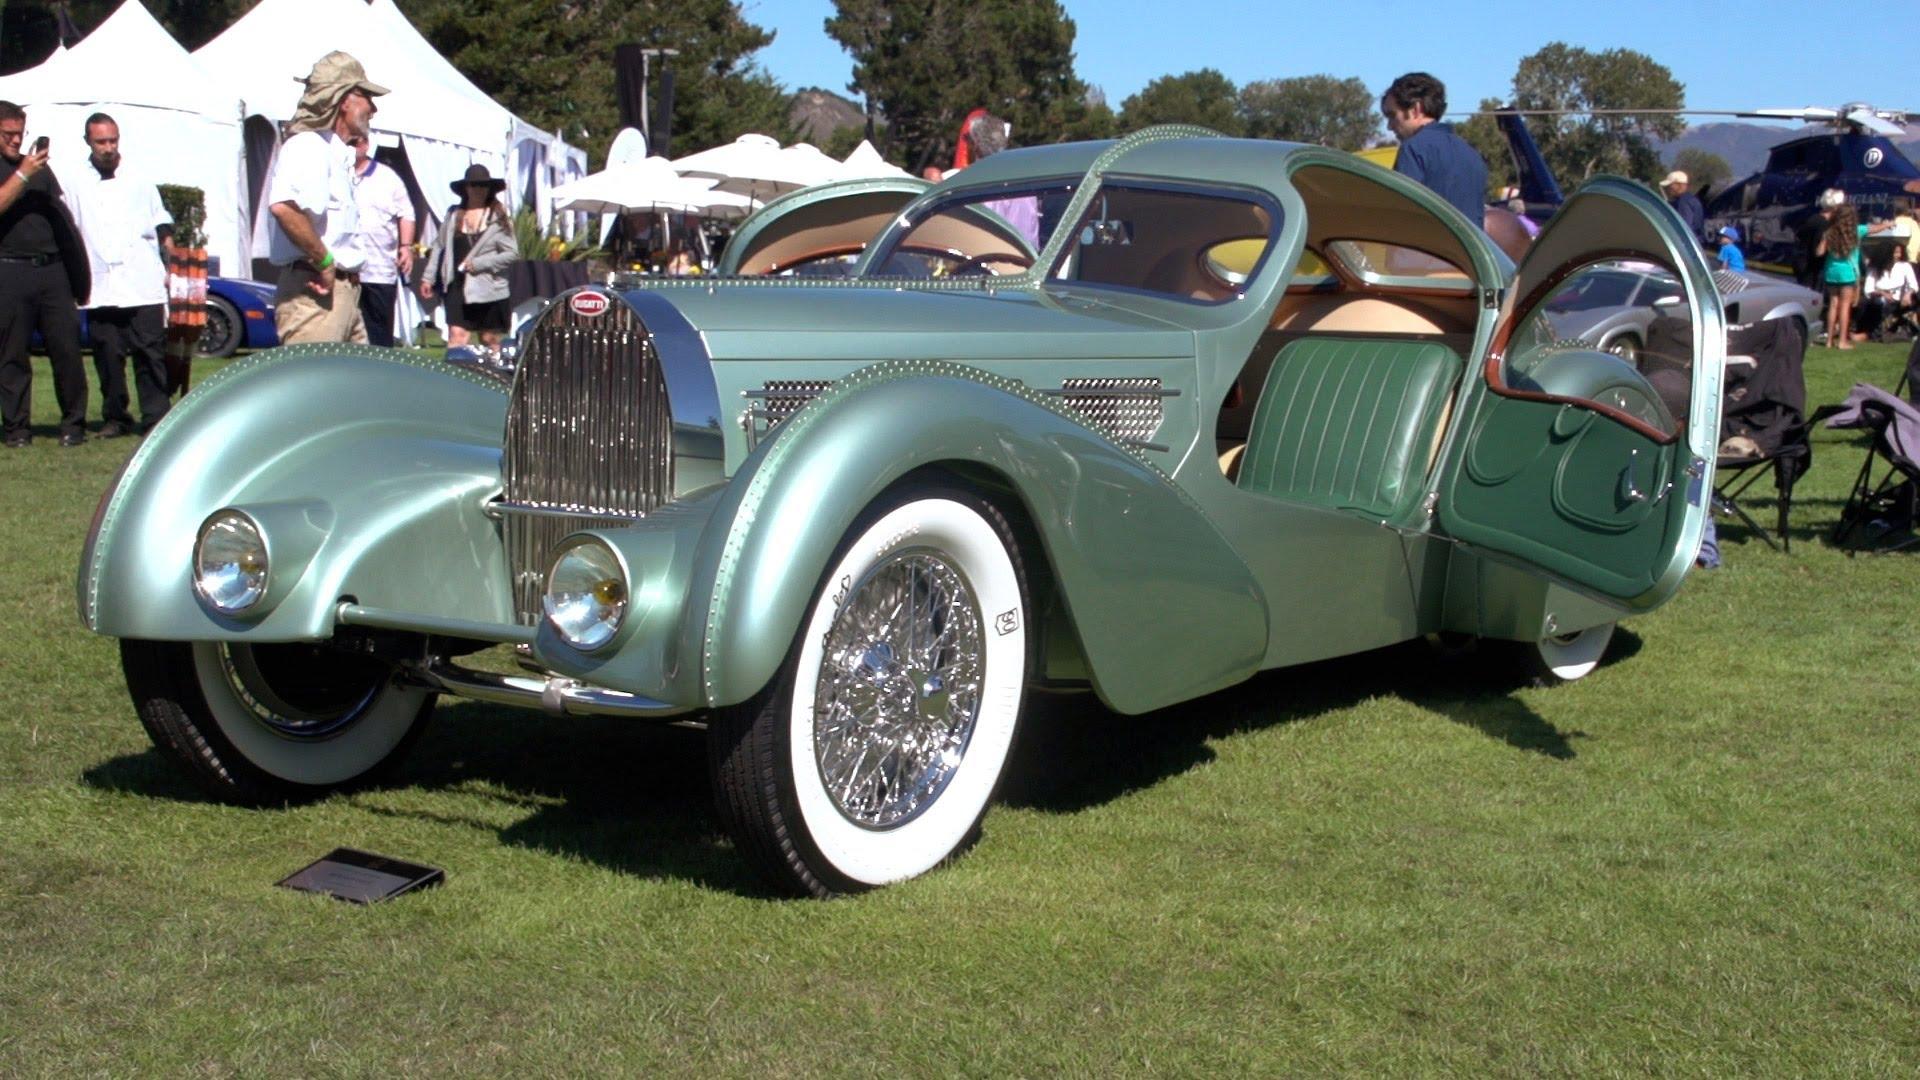 High Resolution Wallpaper | Bugatti Aerolithe 1920x1080 px